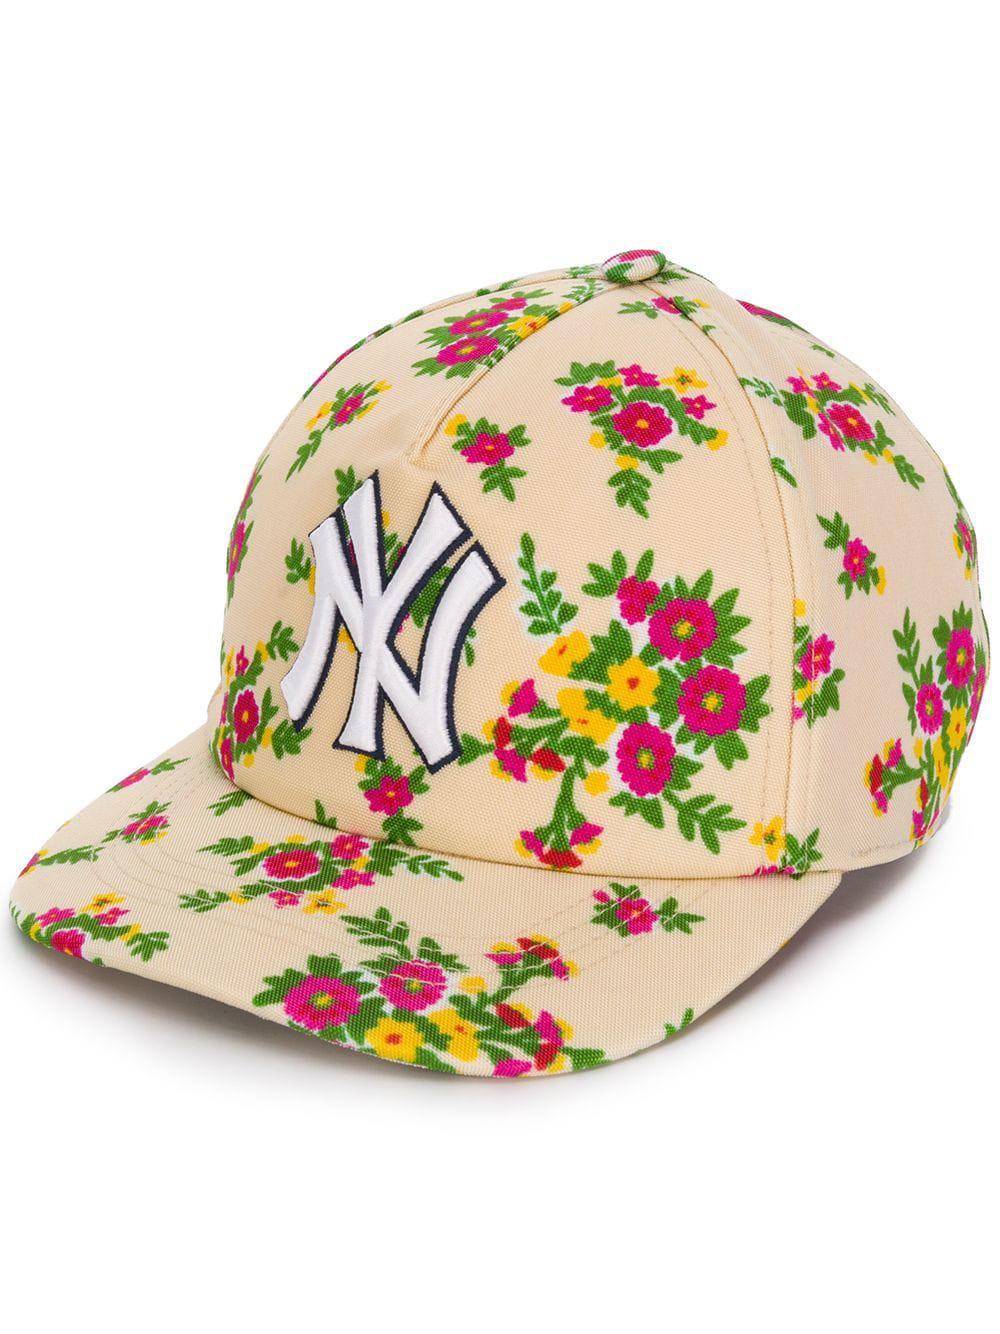 626ae226b4f0c2 Gucci Ny Yankees Floral Cap - Neutrals | ModeSens